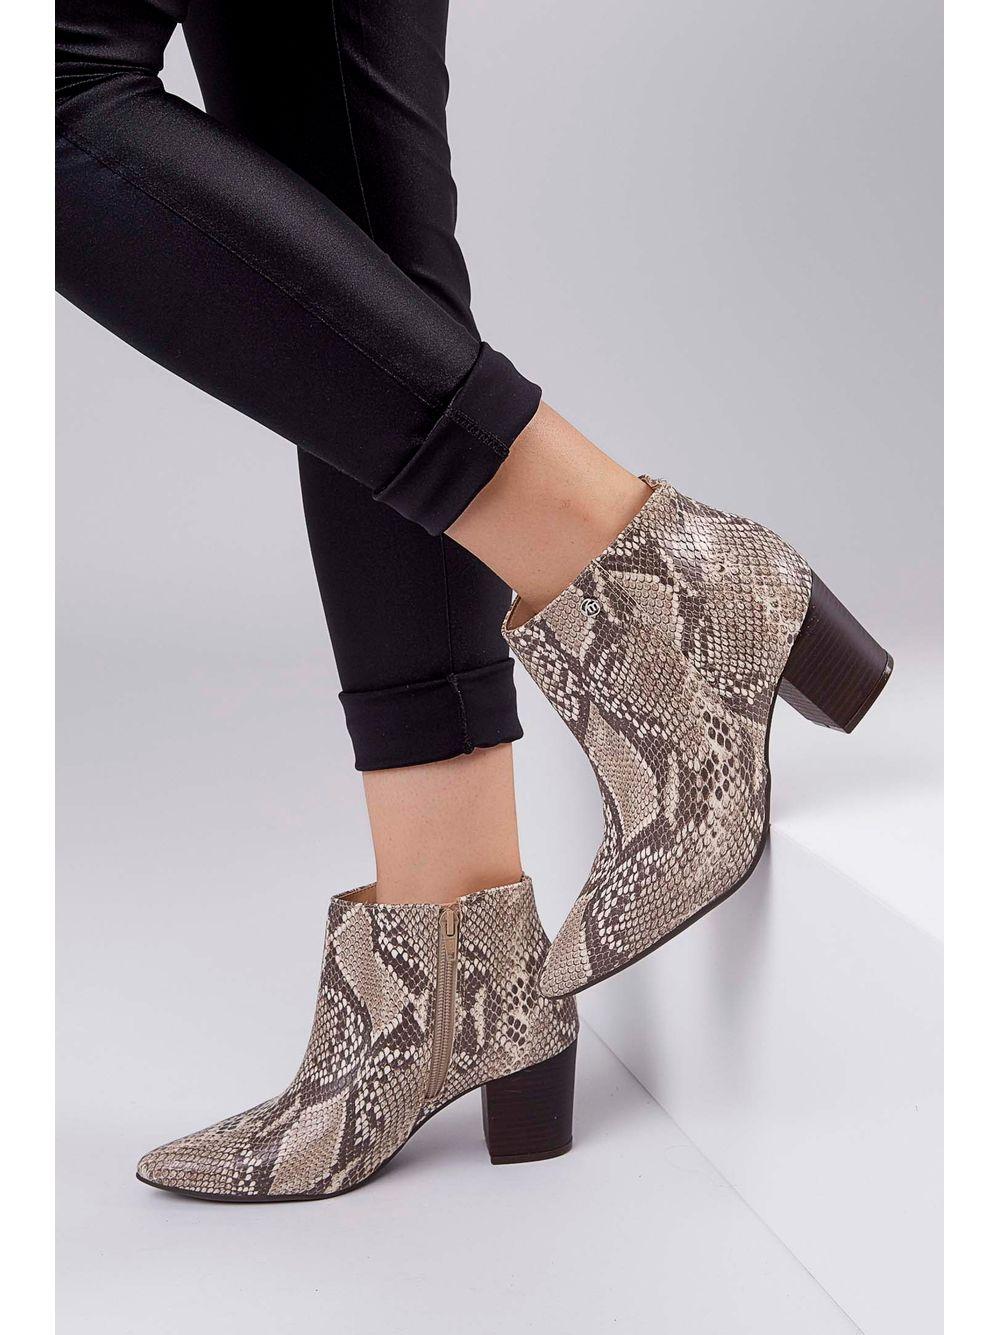 2573df790 Bota Ankle Boot Via Marte Bico Fino Cobra Animal Print Bege - pittol